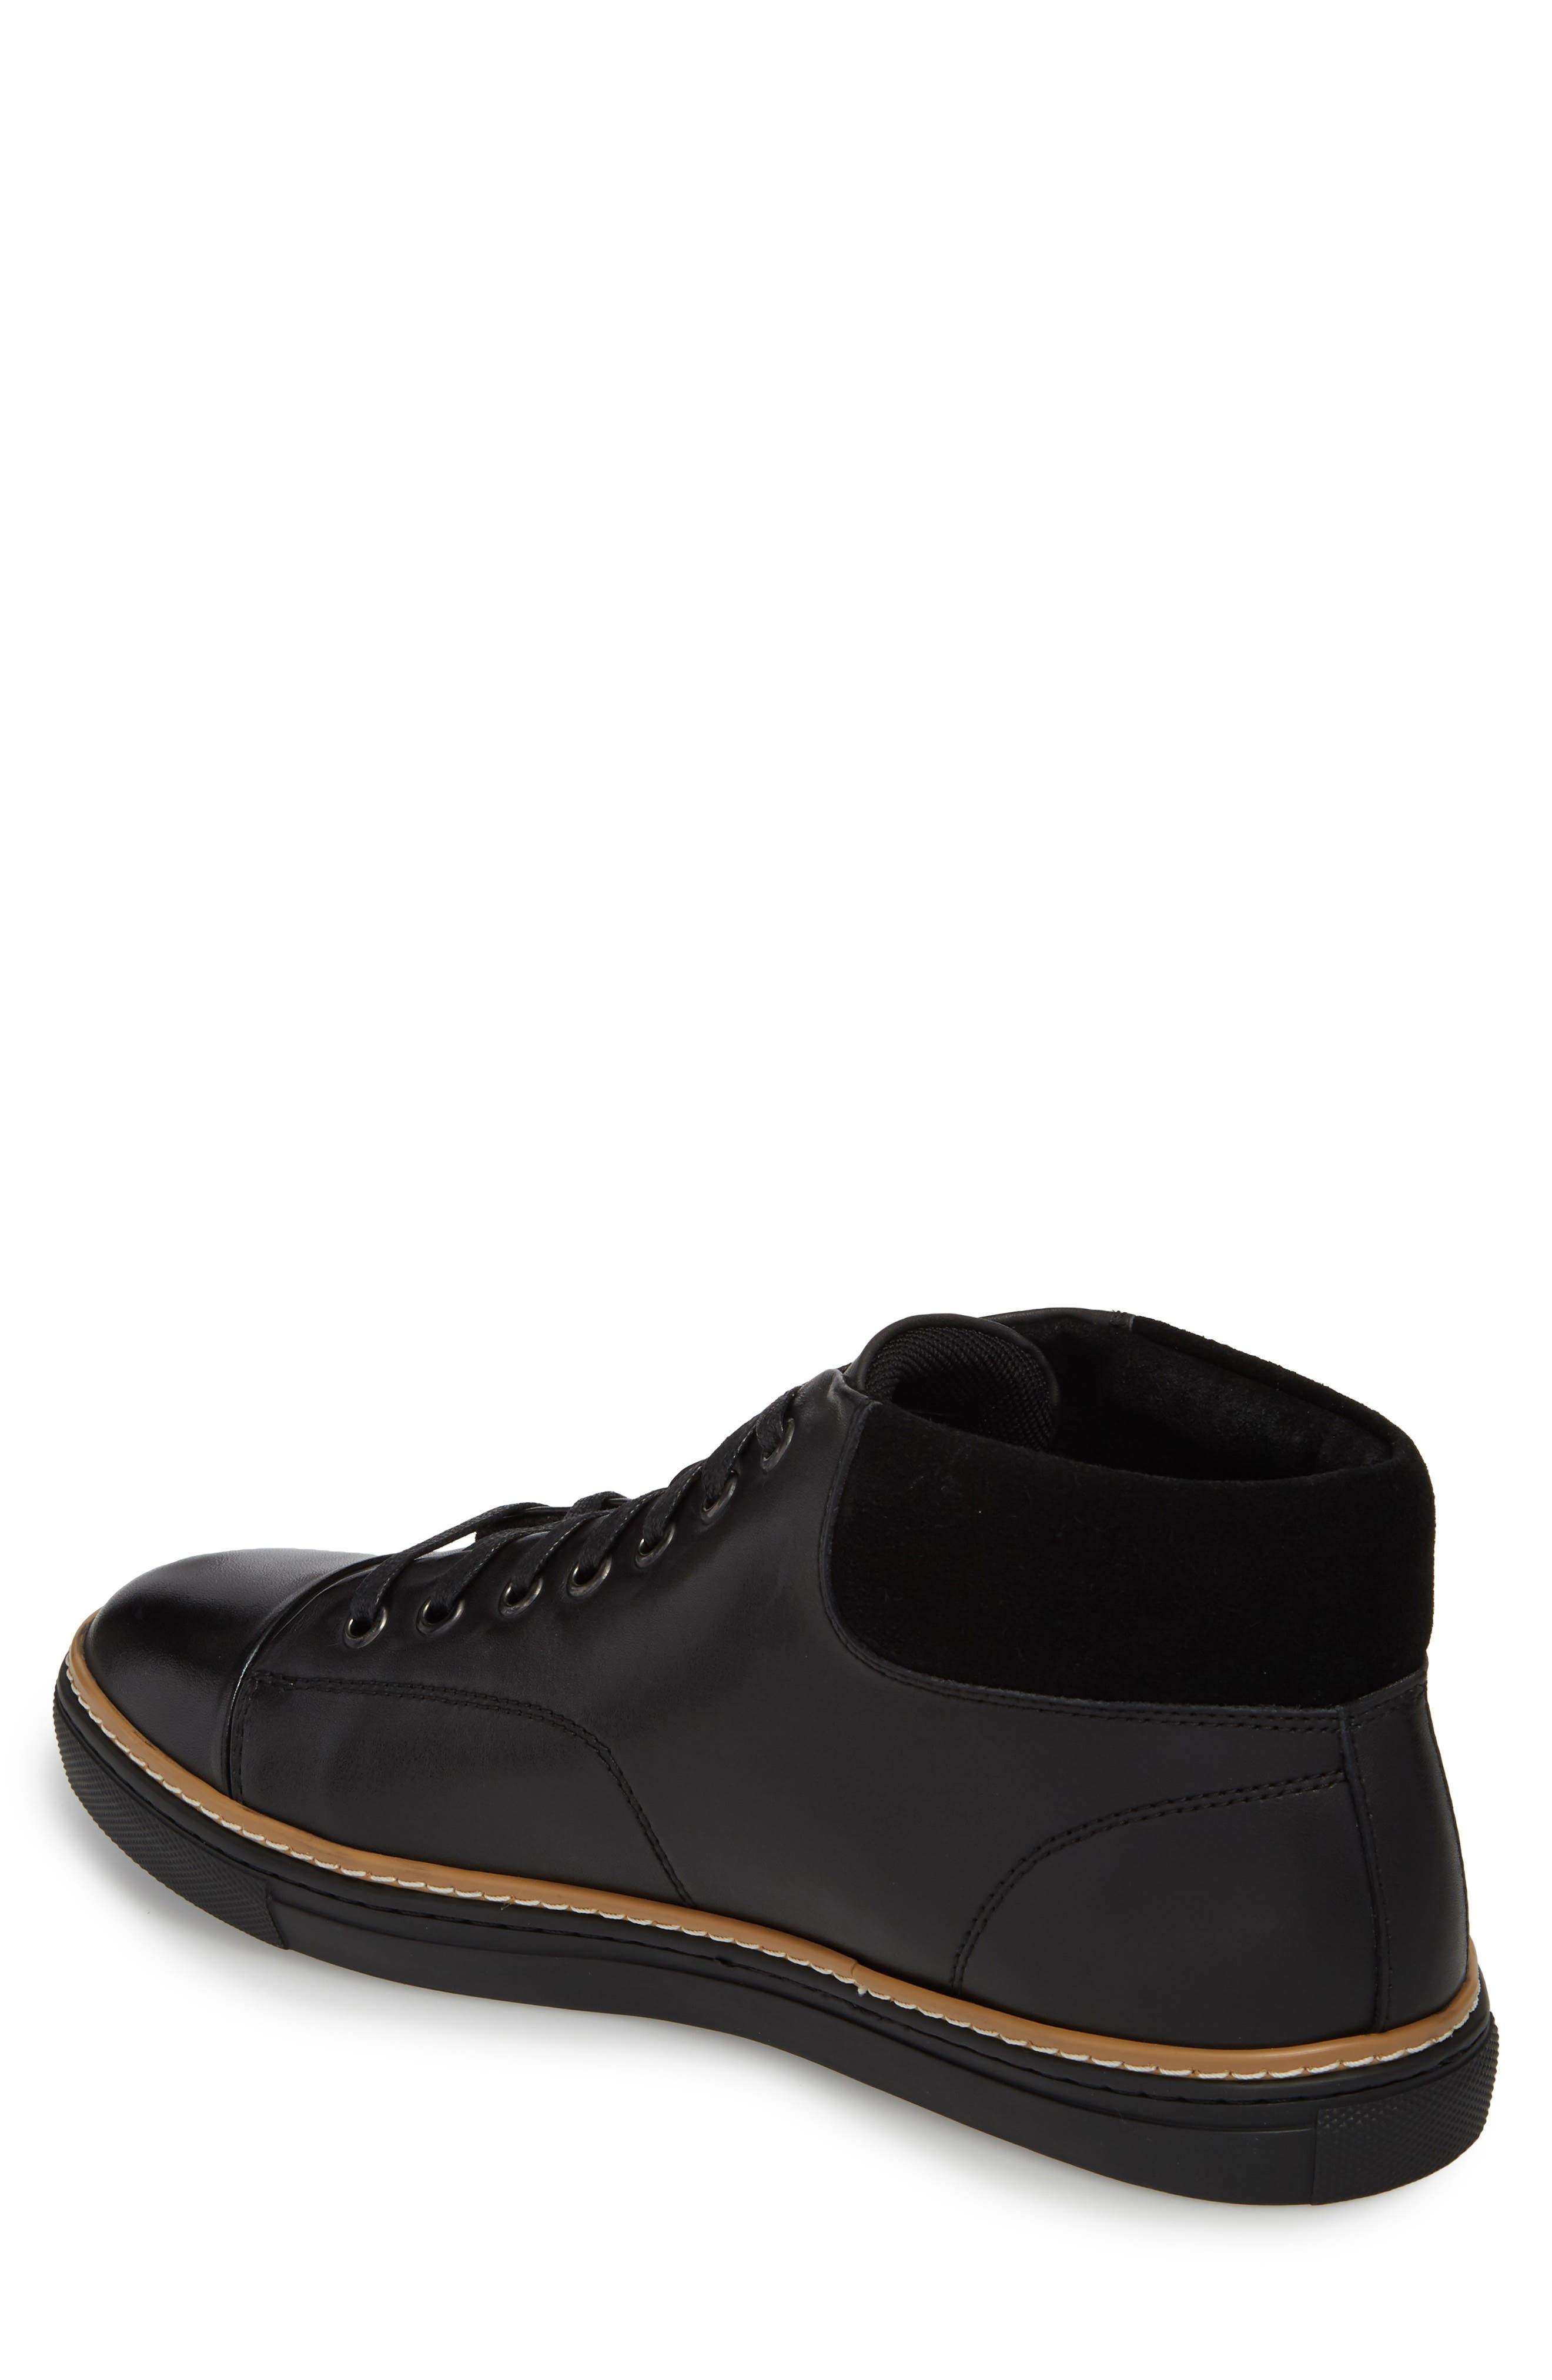 Grove Sneaker,                             Alternate thumbnail 2, color,                             BLACK LEATHER